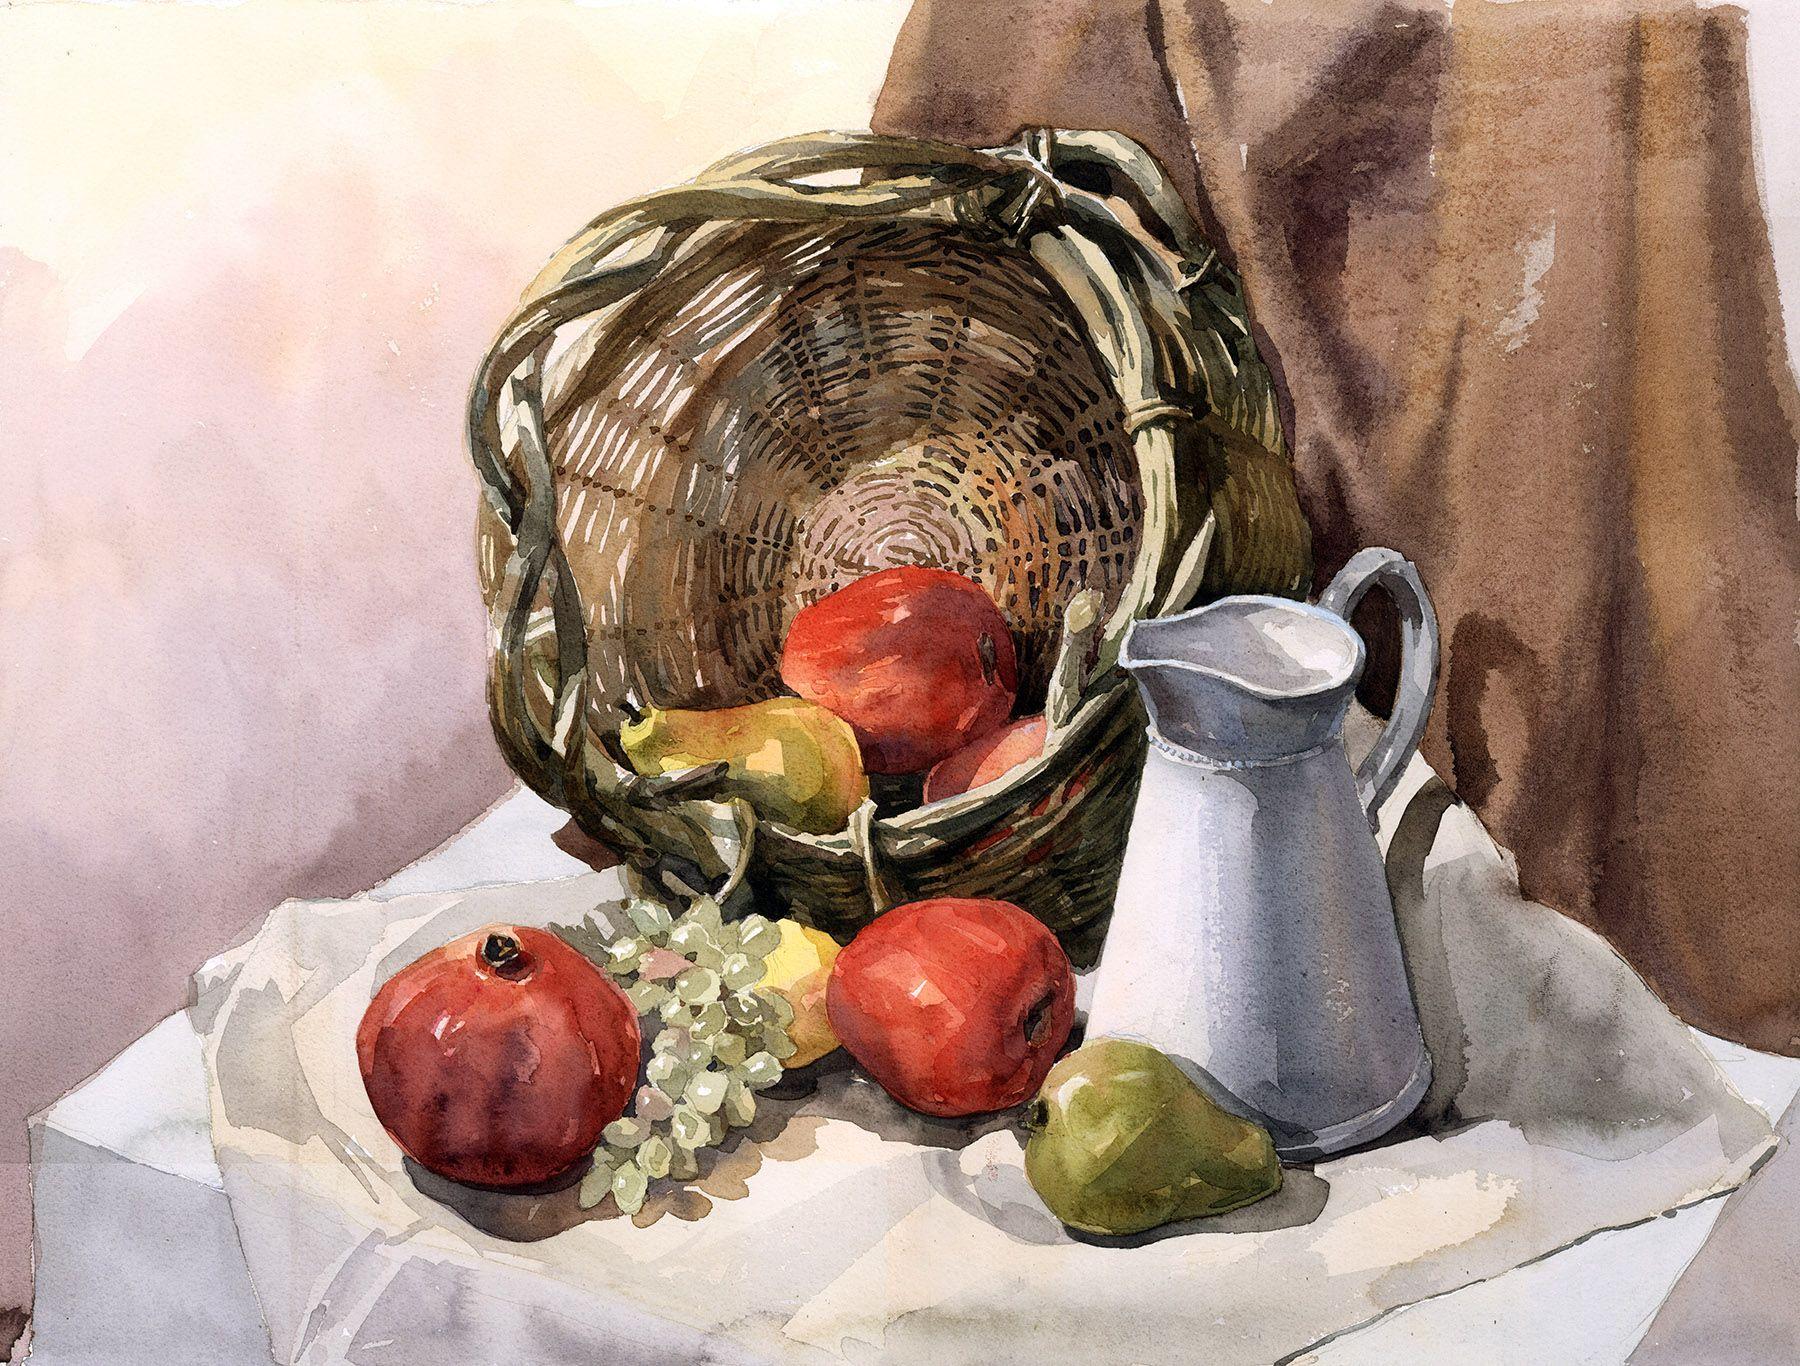 Watercolor artist magazine palm coast fl - Watercolor Gallery Artist Vladislav Yeliseyev Renaissance School Of Art